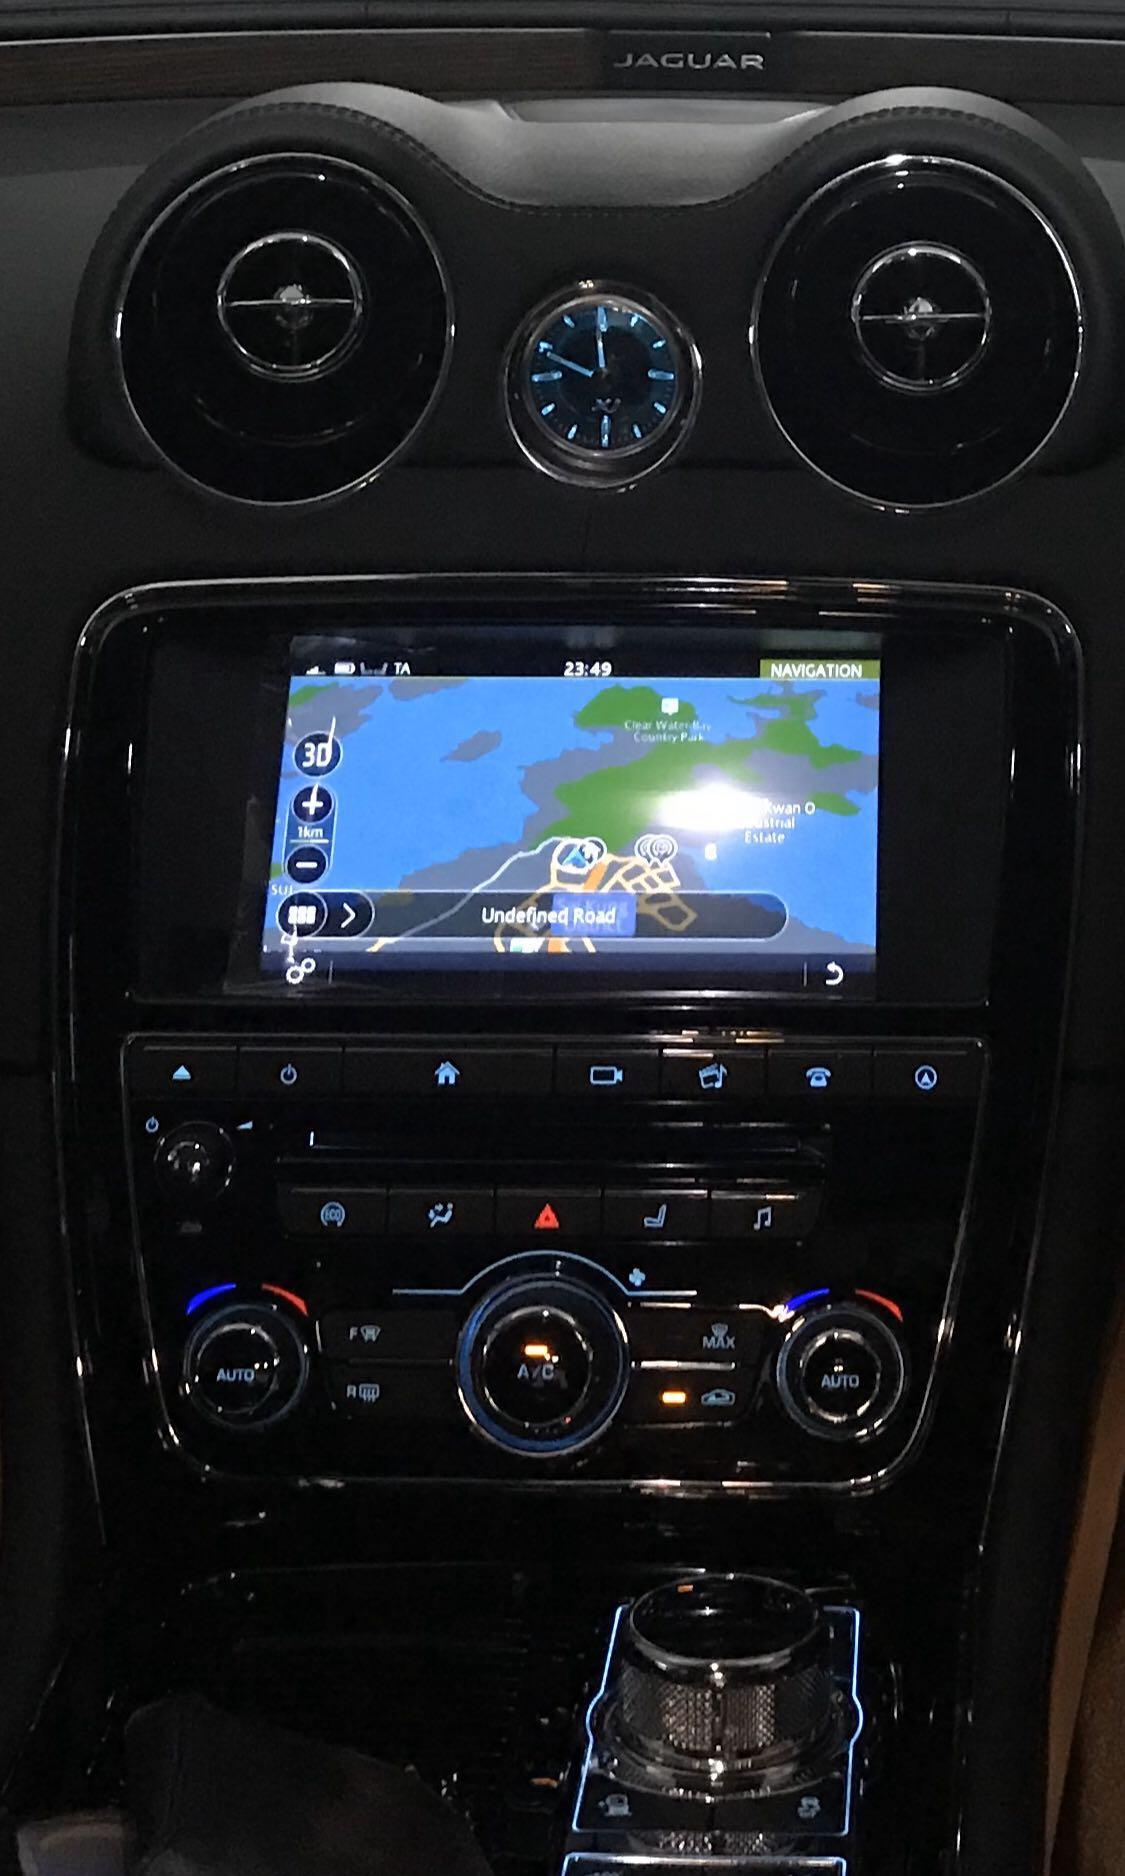 Jaguar XJ 2.0 Premium Luxury LWB (A)